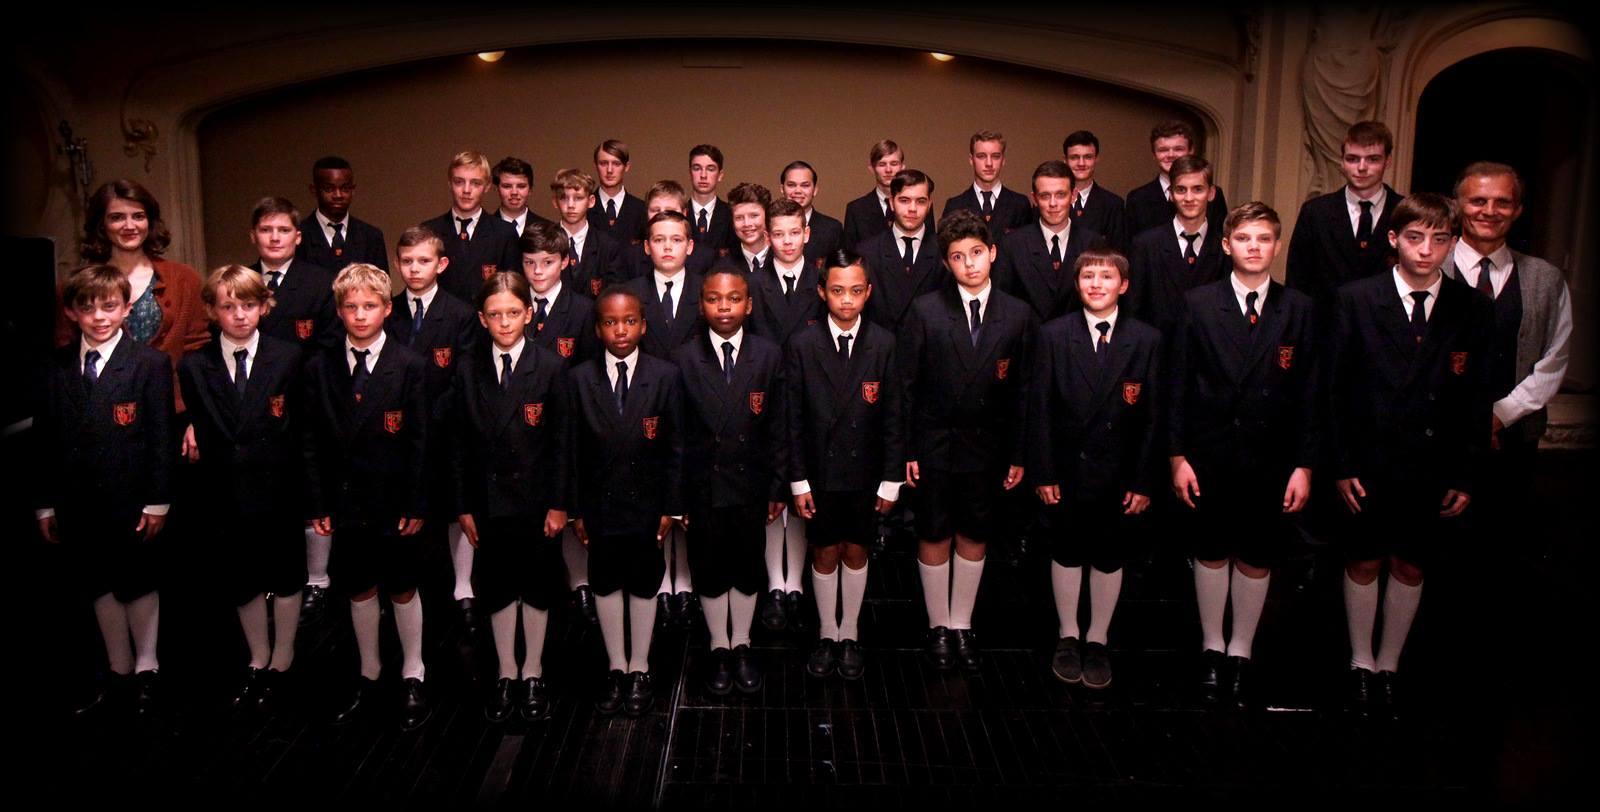 première filmdebuut 'De dirigent'